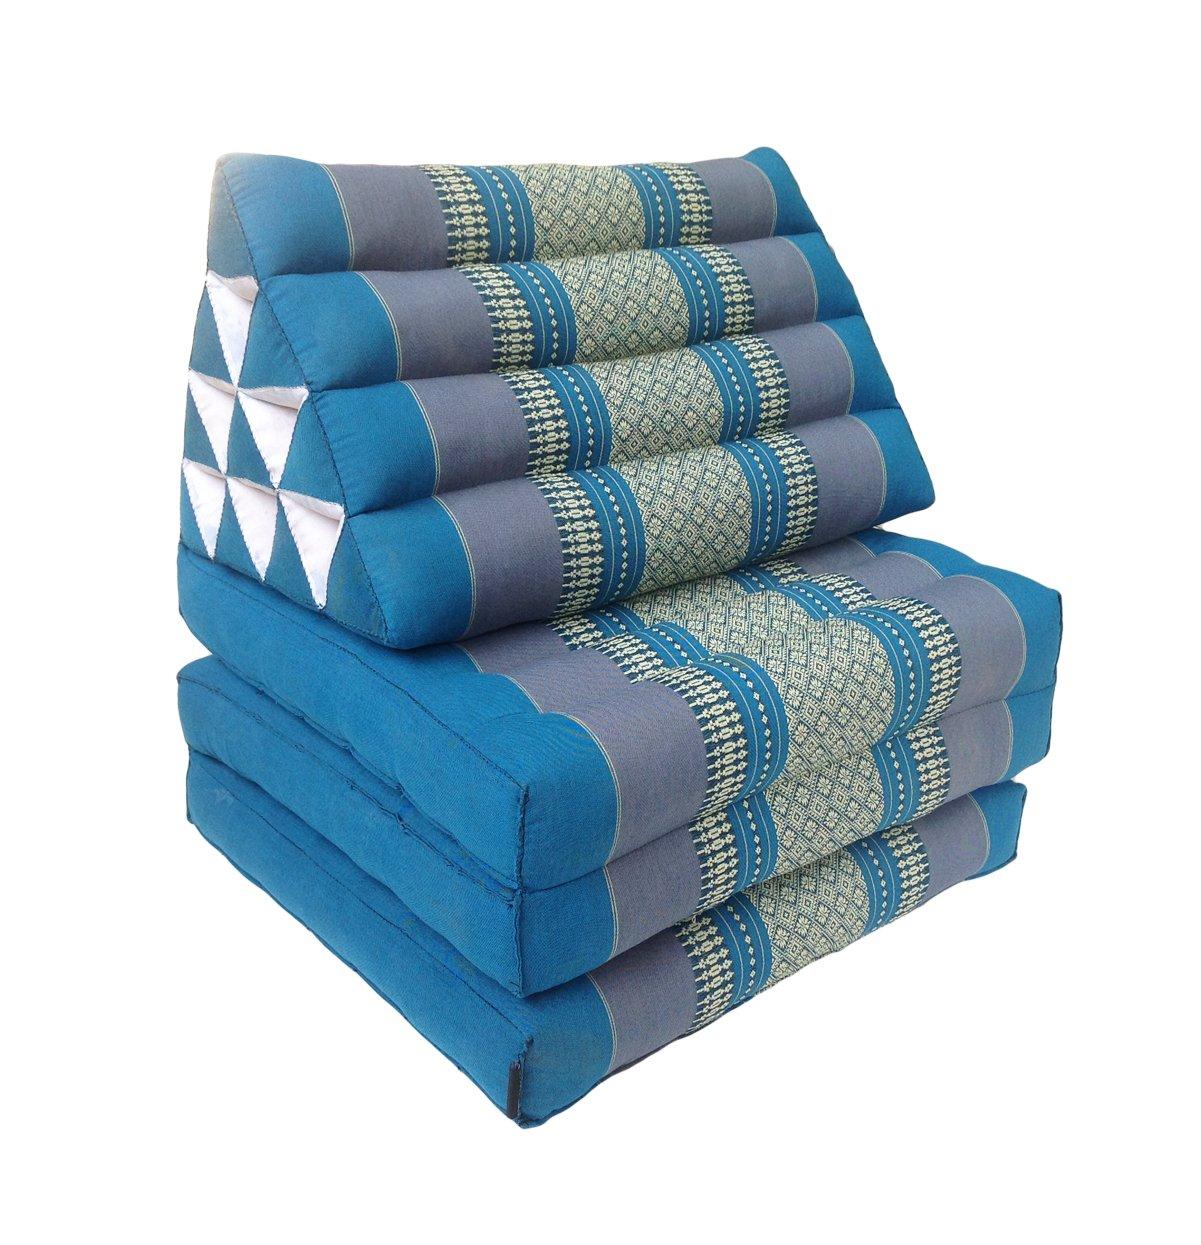 Colchón de meditación tailandés de fibra Kapok de 3 pliegues, estilo oriental, con respaldo triangular y almohadón de meditación Zafu a juego, para yoga, ...